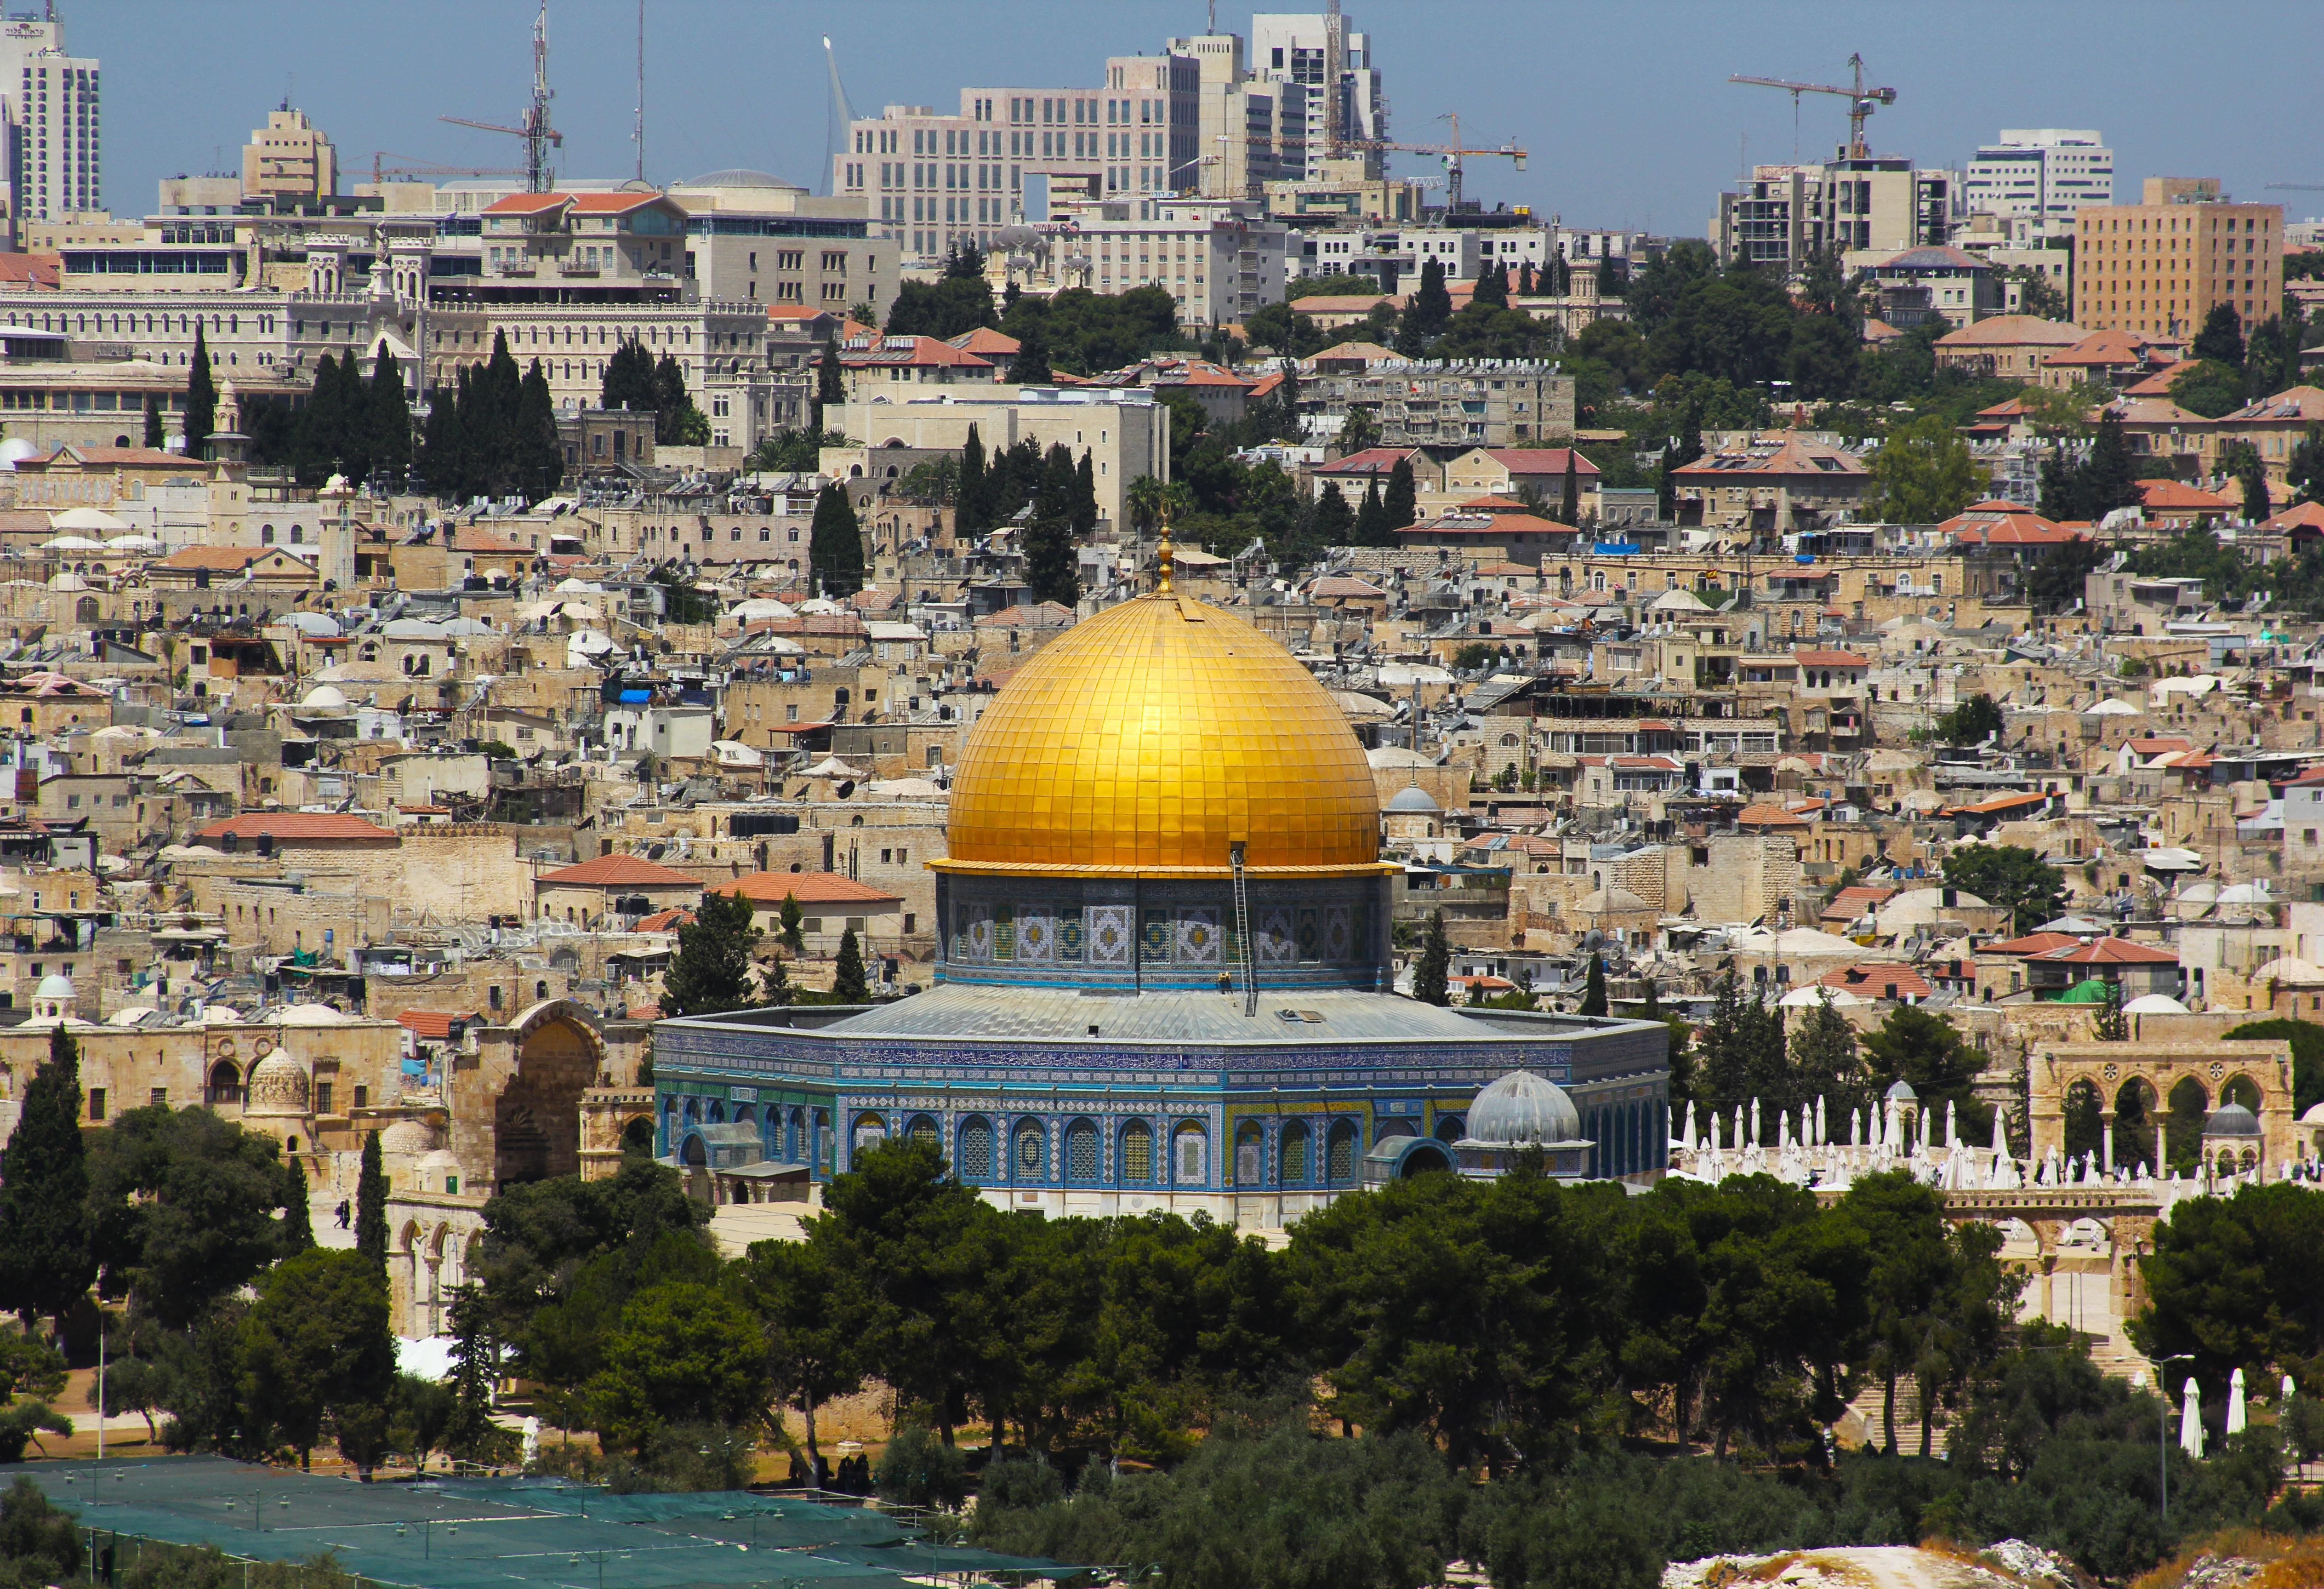 спэйдер картинки про израиль прочитали, сфечи